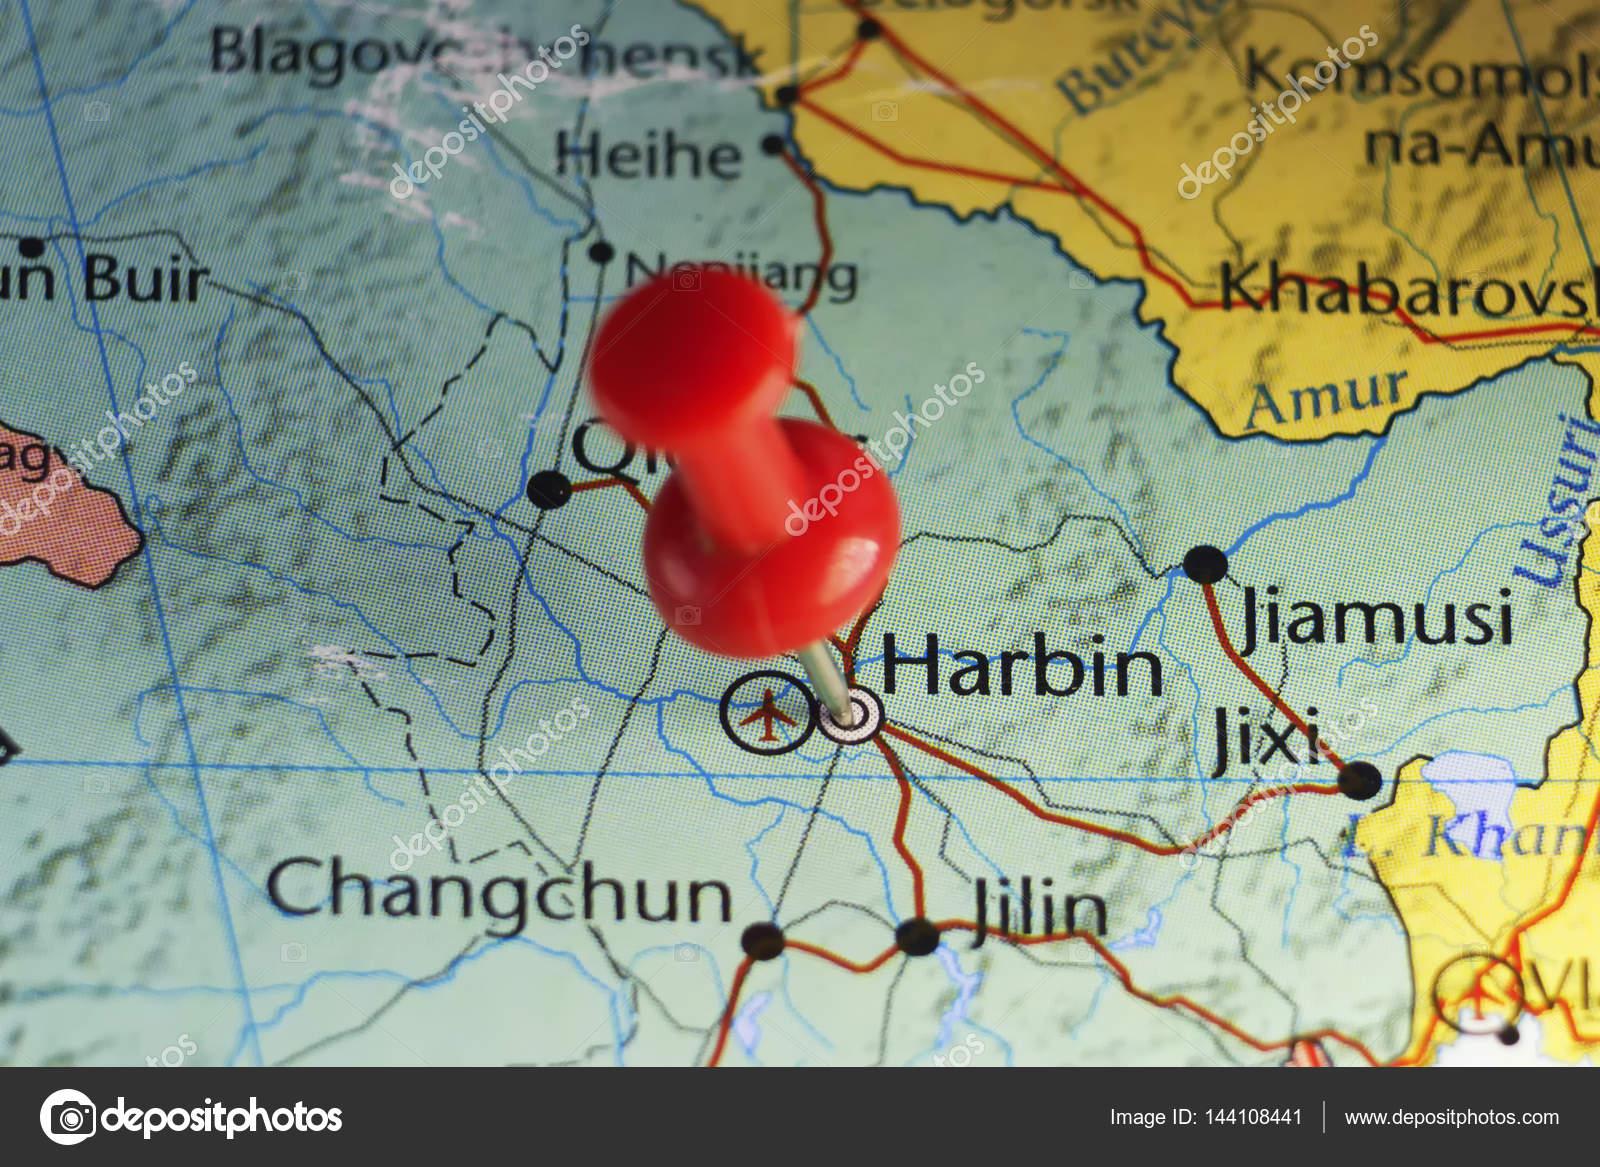 Pin rojo en harbin china foto de stock llucky78 144108441 pin rojo en harbin china foto de stock gumiabroncs Image collections